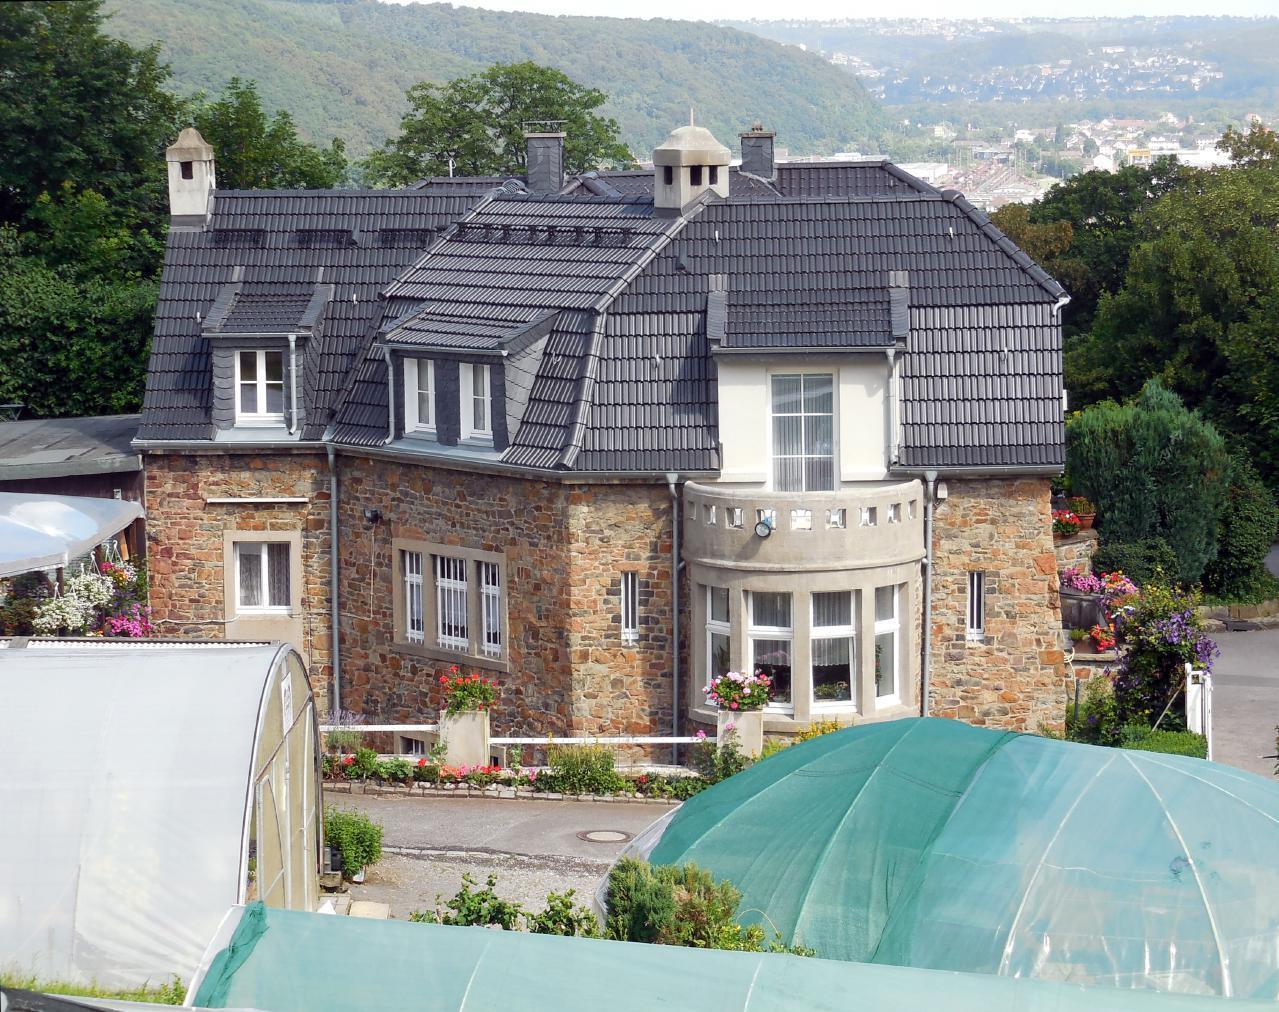 Ferienhaus Denkmalgeschützte van de Velde-Villa (270753), Hagen, Ruhrgebiet, Nordrhein-Westfalen, Deutschland, Bild 23